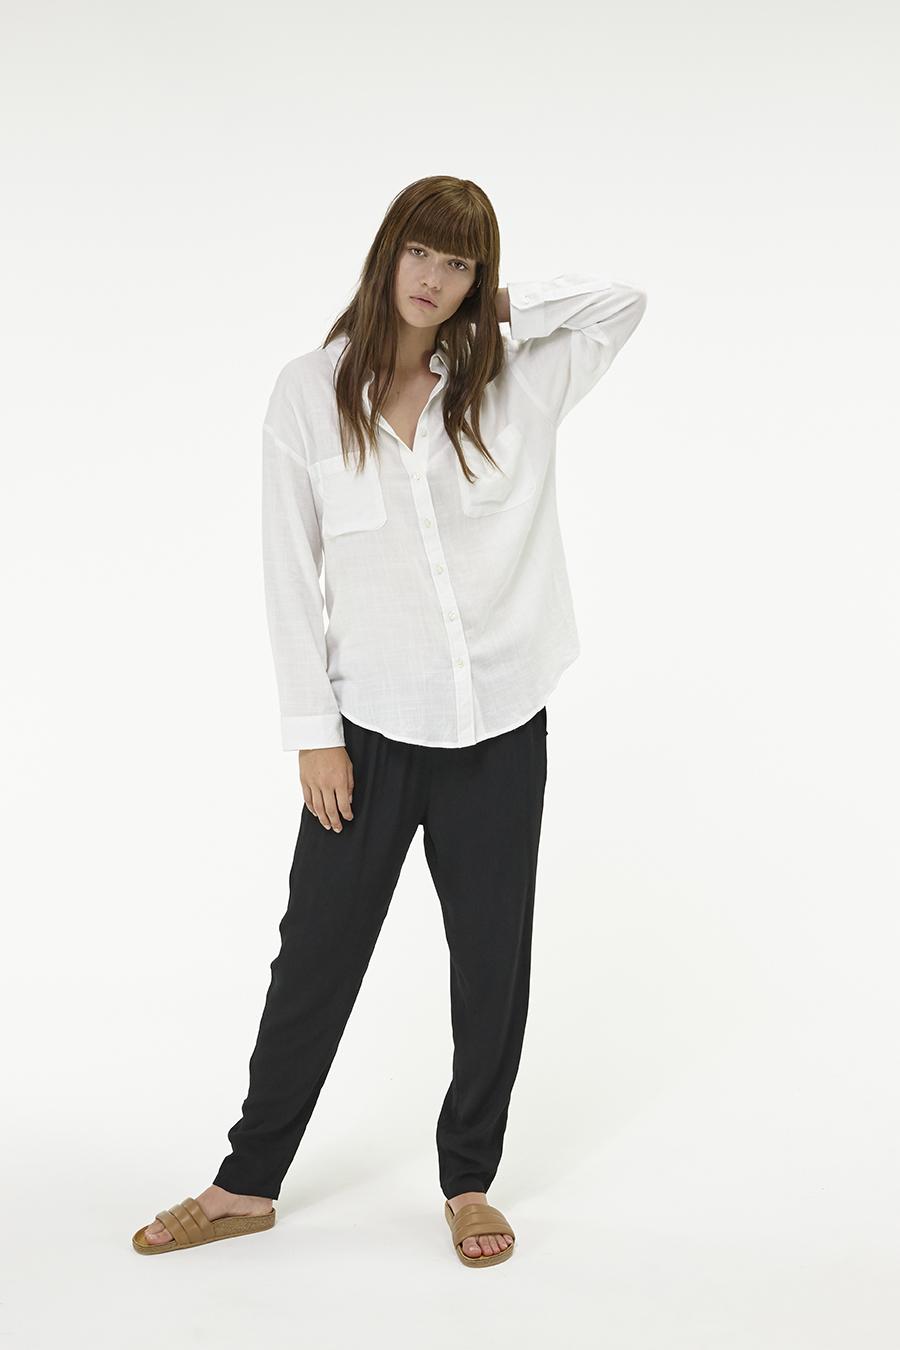 Huffer_Q3-16_W-Rome-Shirt_White-04